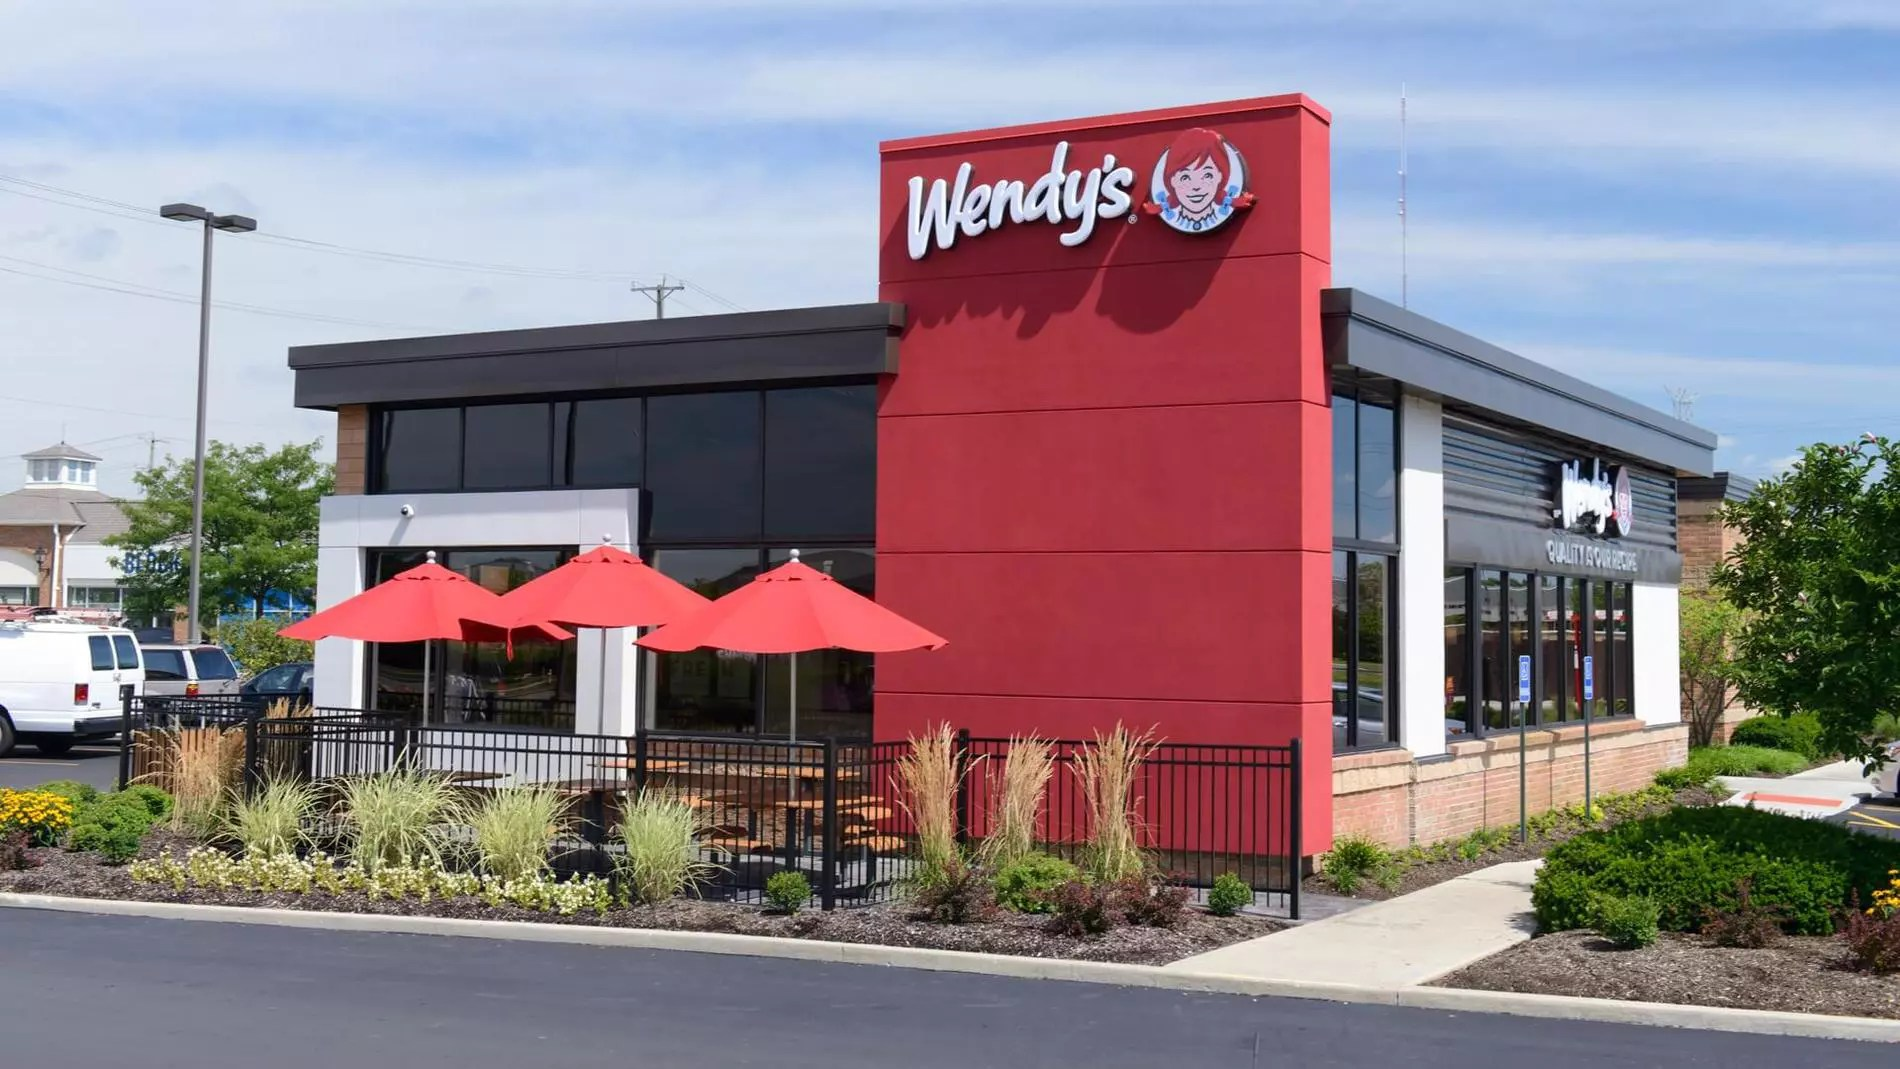 Pleasing About West Street West Fast Ken Wendy S T Rex Burger Nz Wendy S T Rex Burger Reddit nice food Wendys Trex Burger